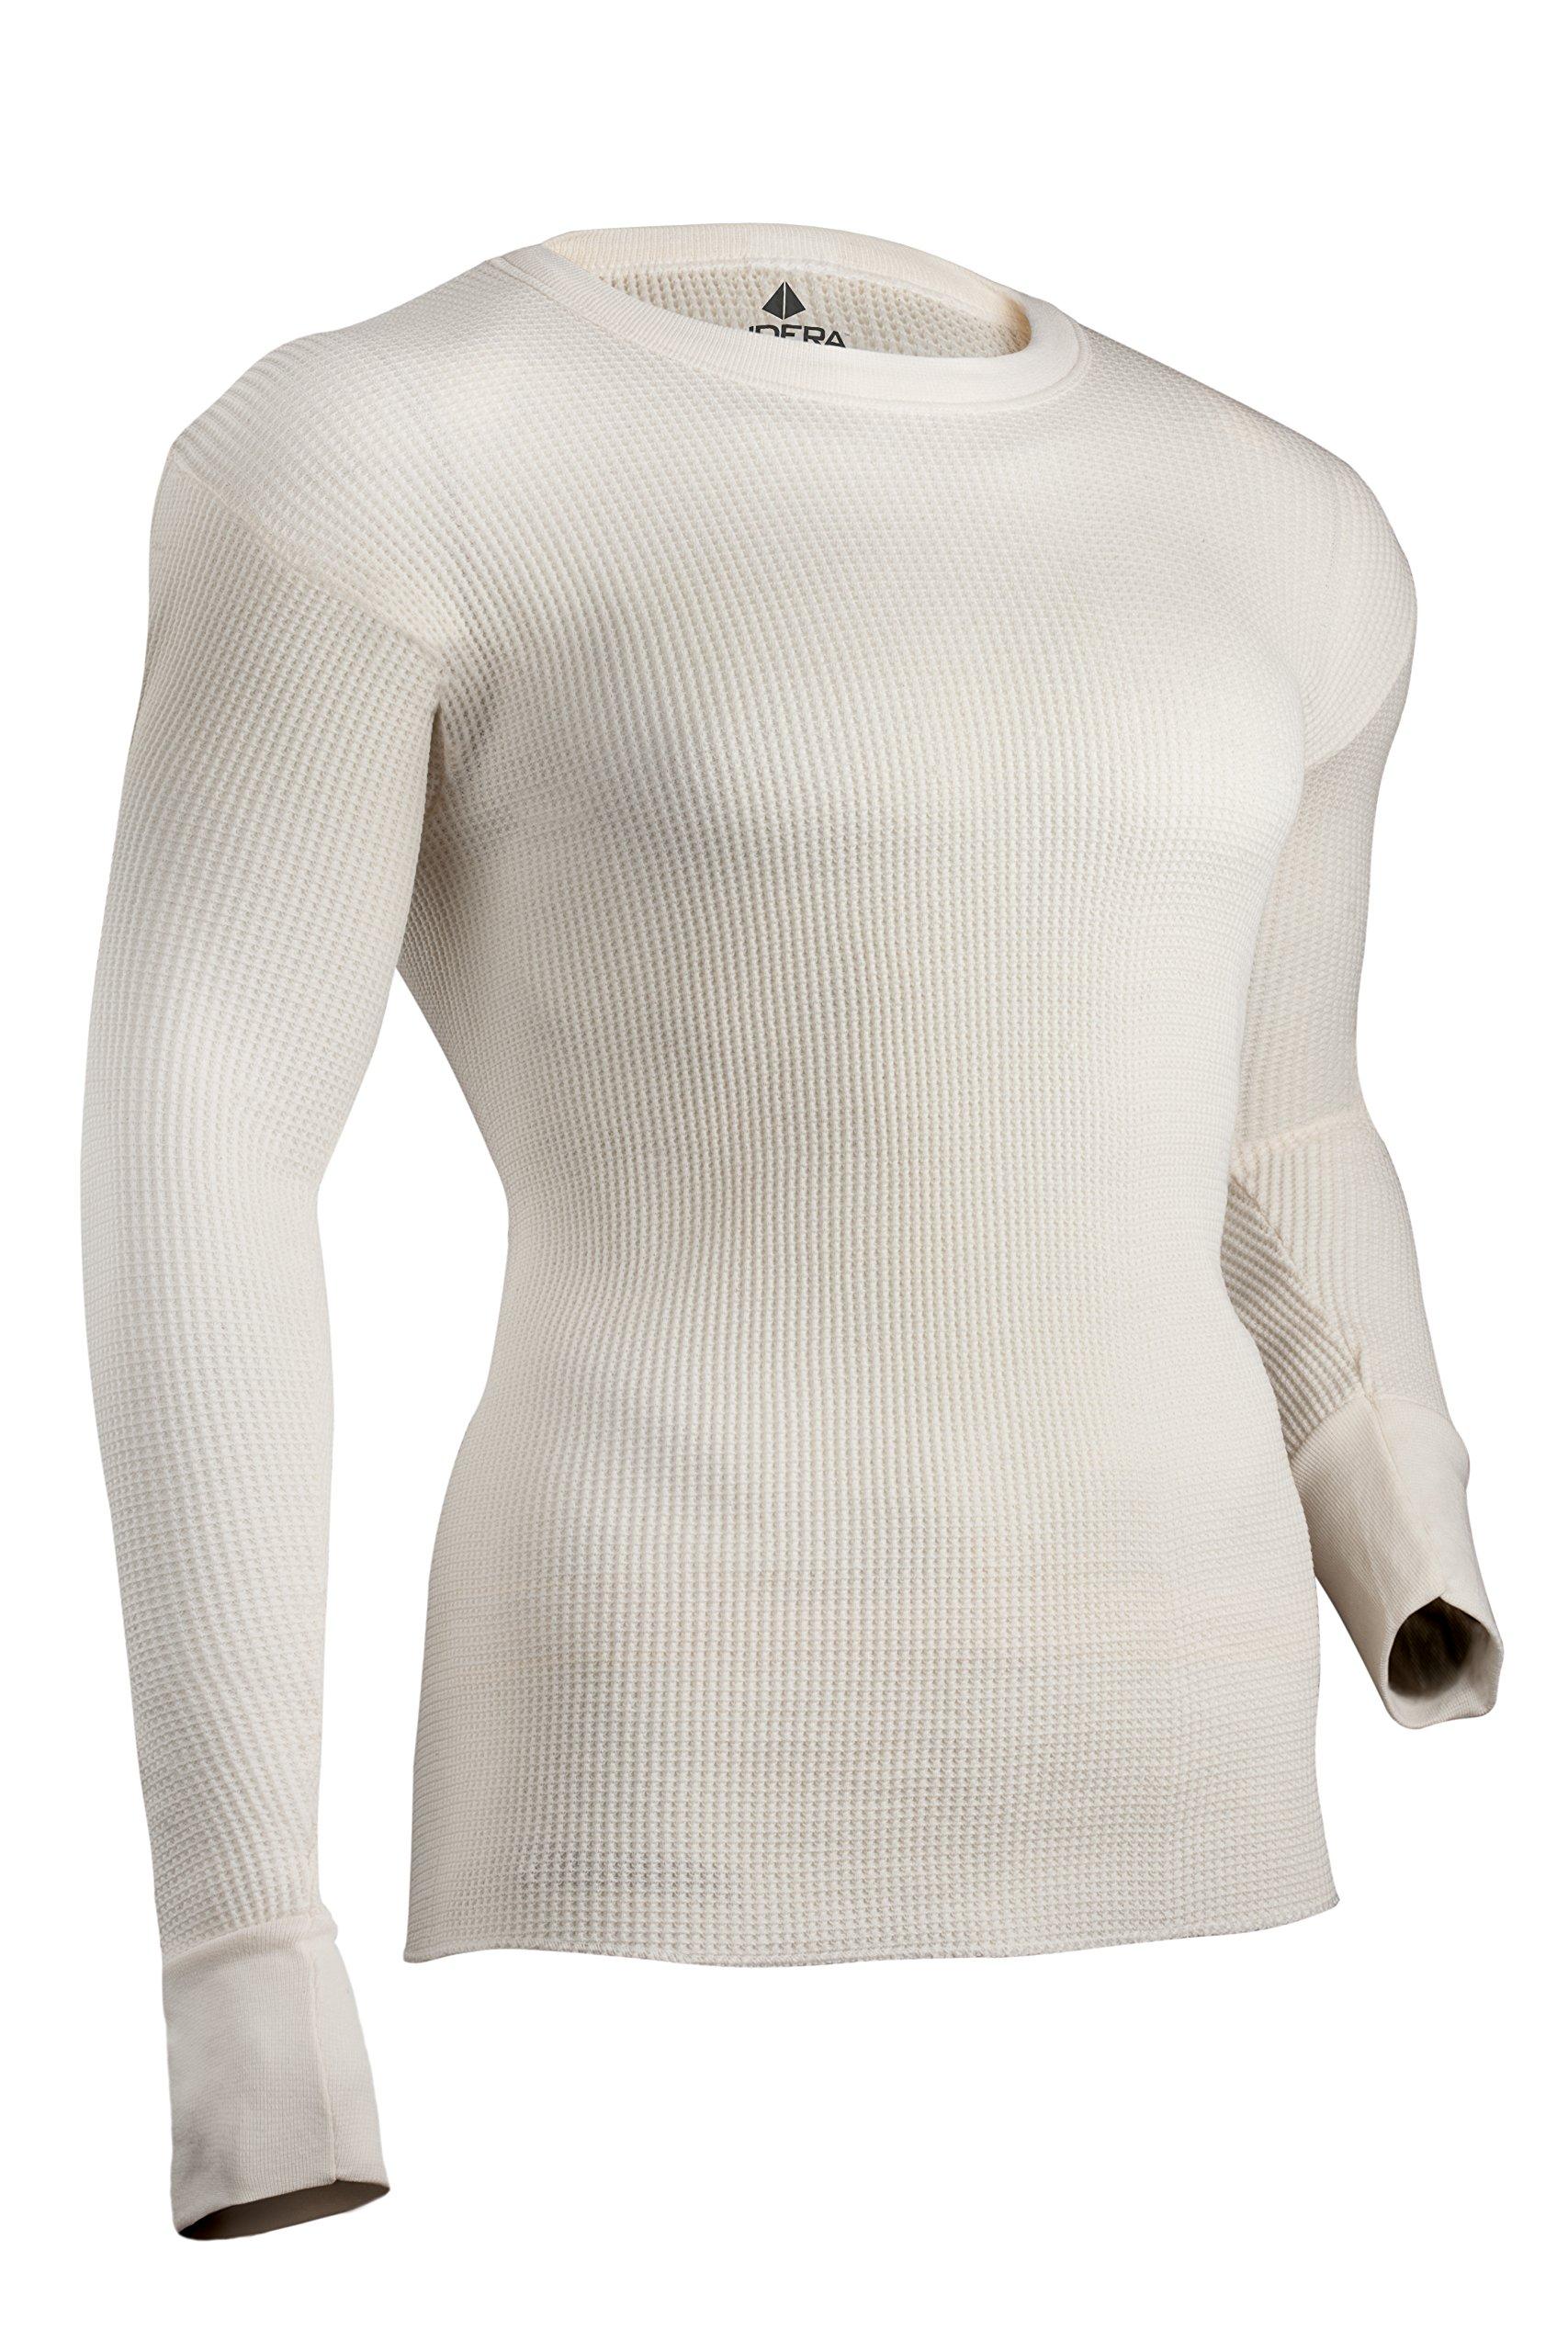 Indera Men's Maximum Weight Thermal Underwear Top, Natural, X-Large by Indera